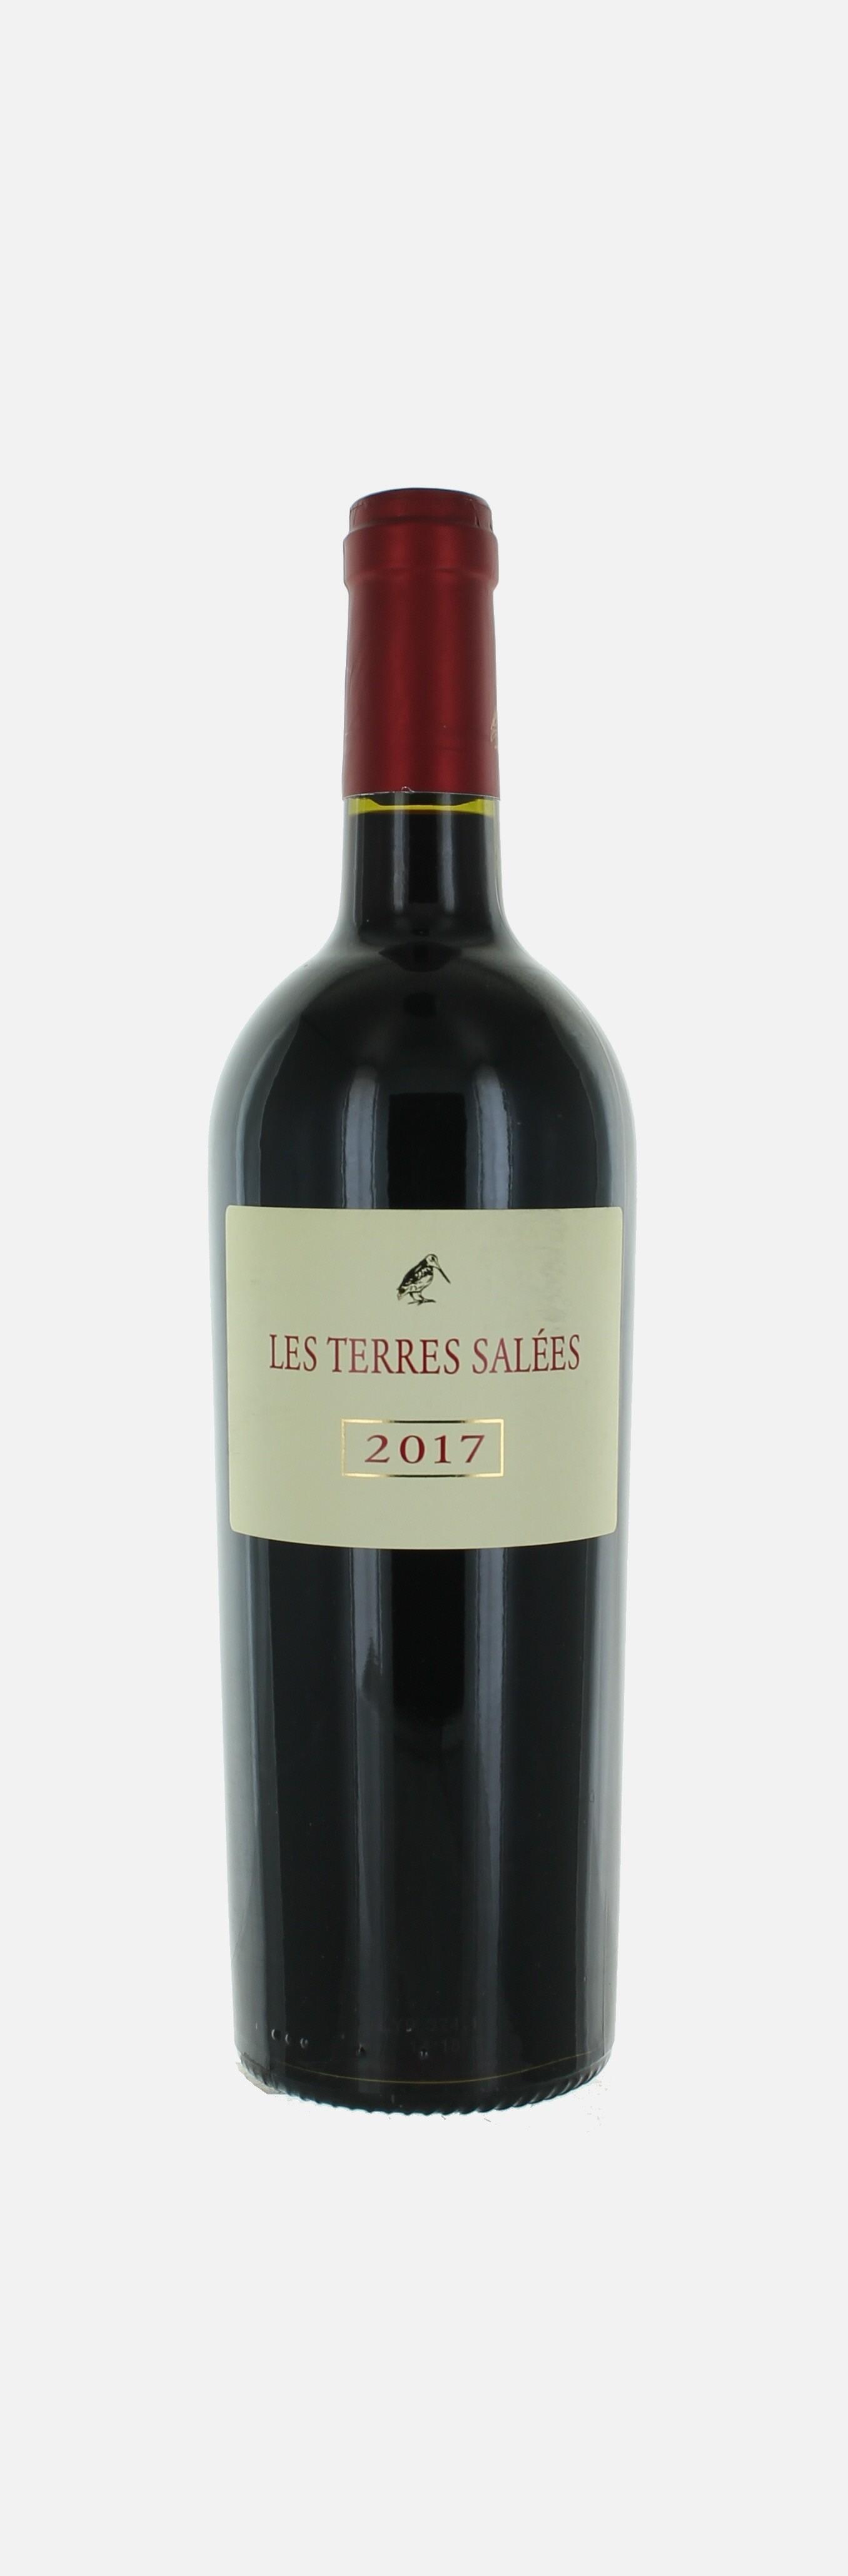 Terres salées, Côtes de Pérignan, Barbier